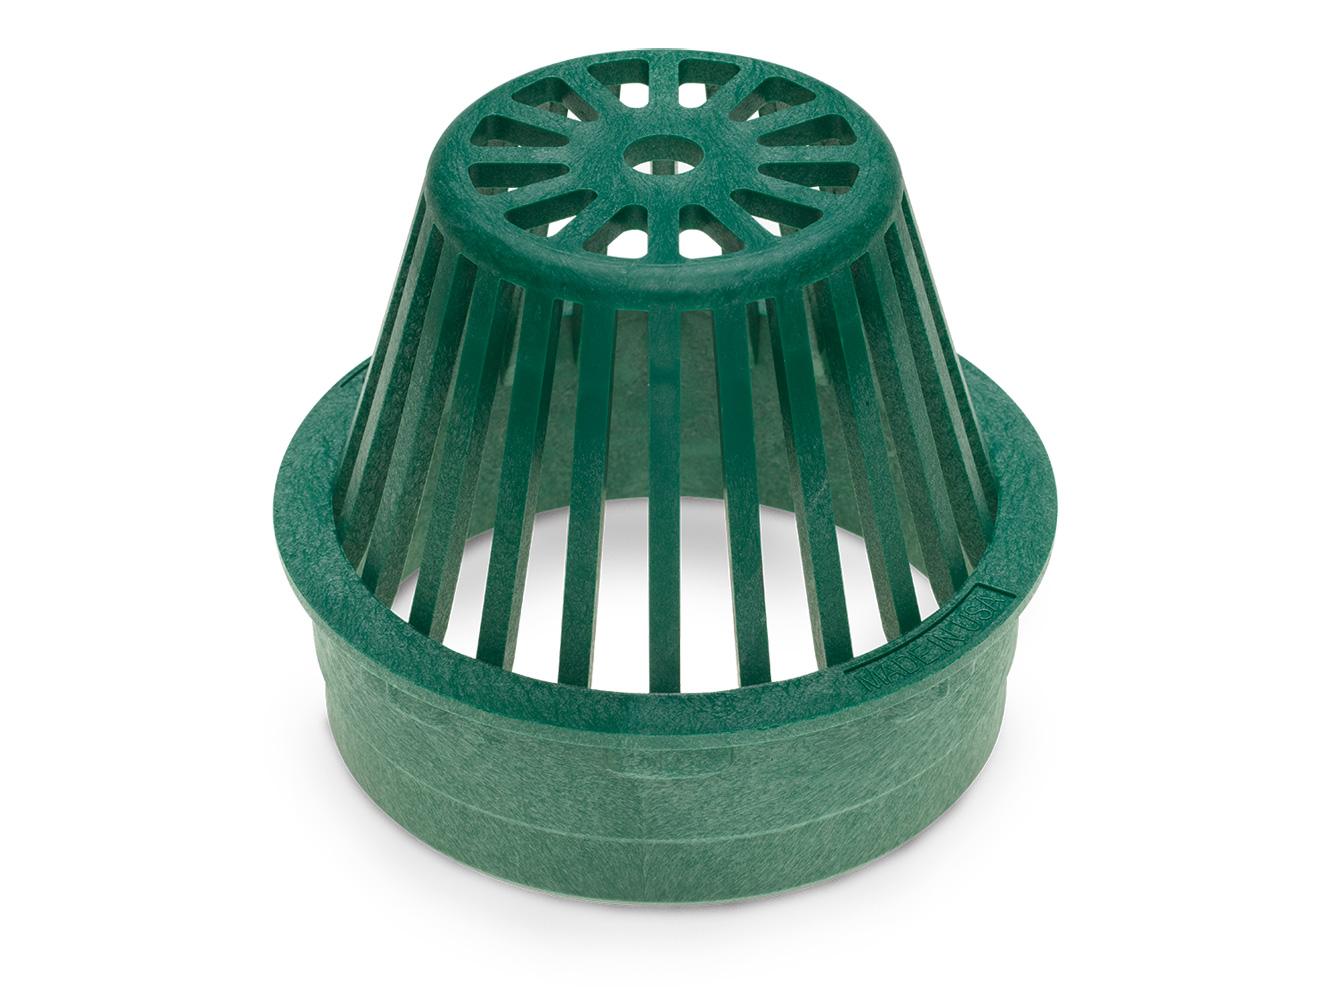 "Rain Bird DG6RAG 6"" Round Atrium Drainage Grate - Green"